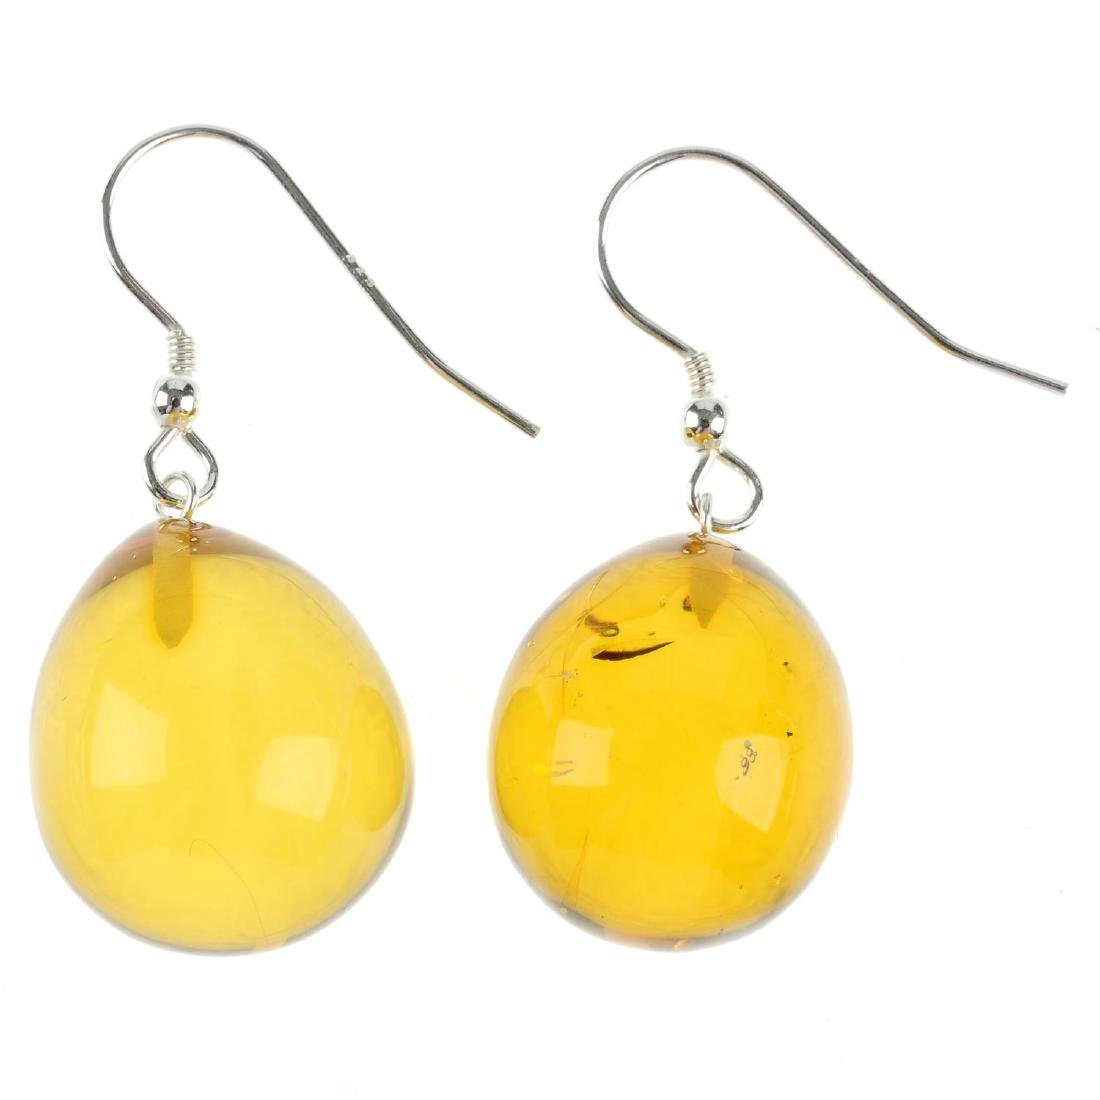 A pair of natural Dominican Republic amber ear pendants